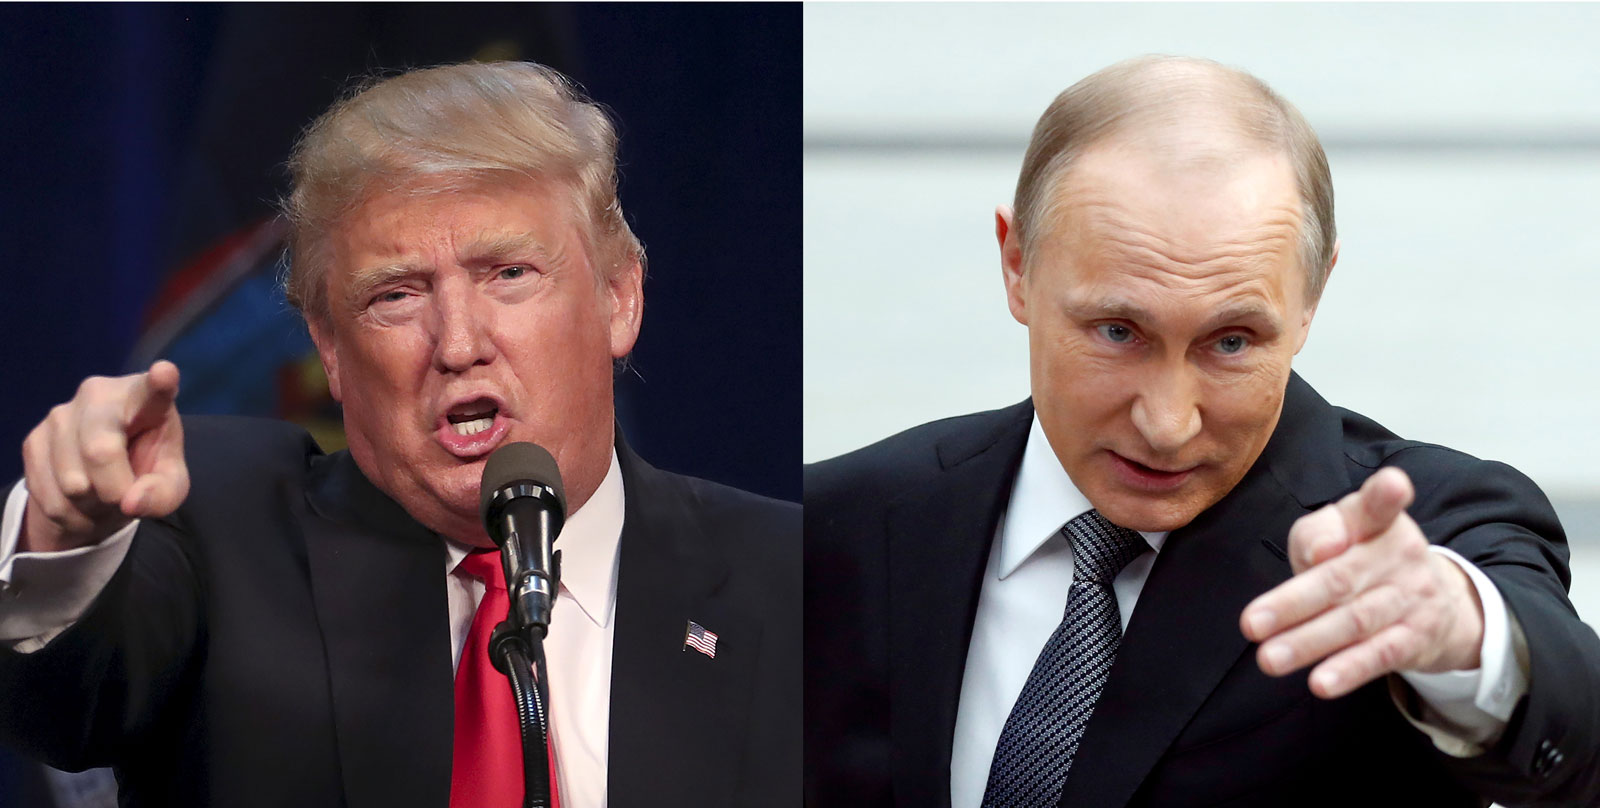 پوتین و ترامپ گؤروشهجک: تلیمات وئریلدی